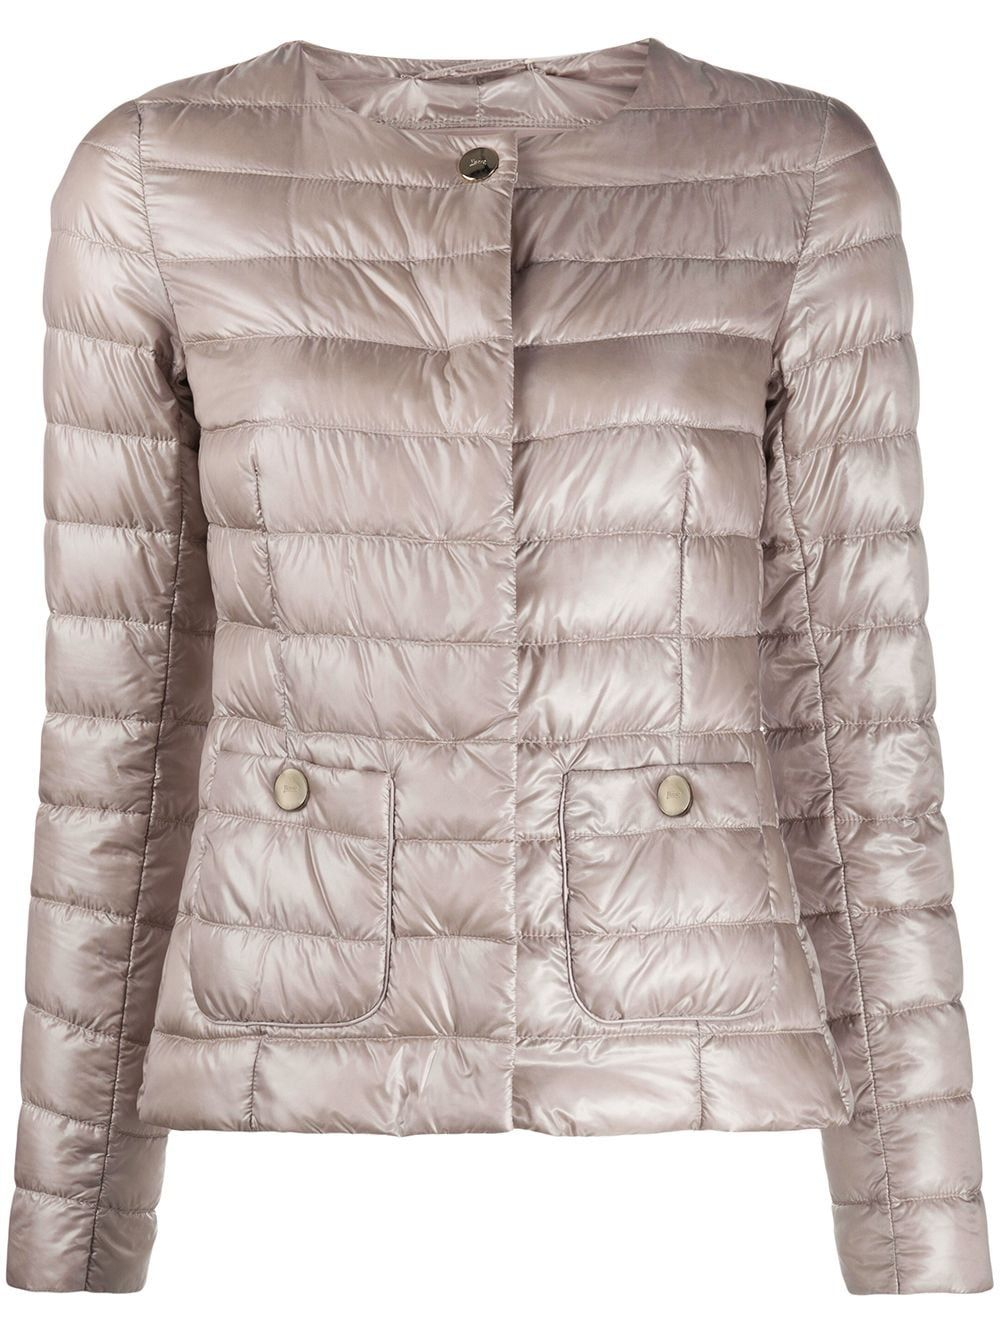 Herno Slim Fit Puffer Jacket Farfetch Puffer Jackets Herno Jackets [ 1334 x 1000 Pixel ]